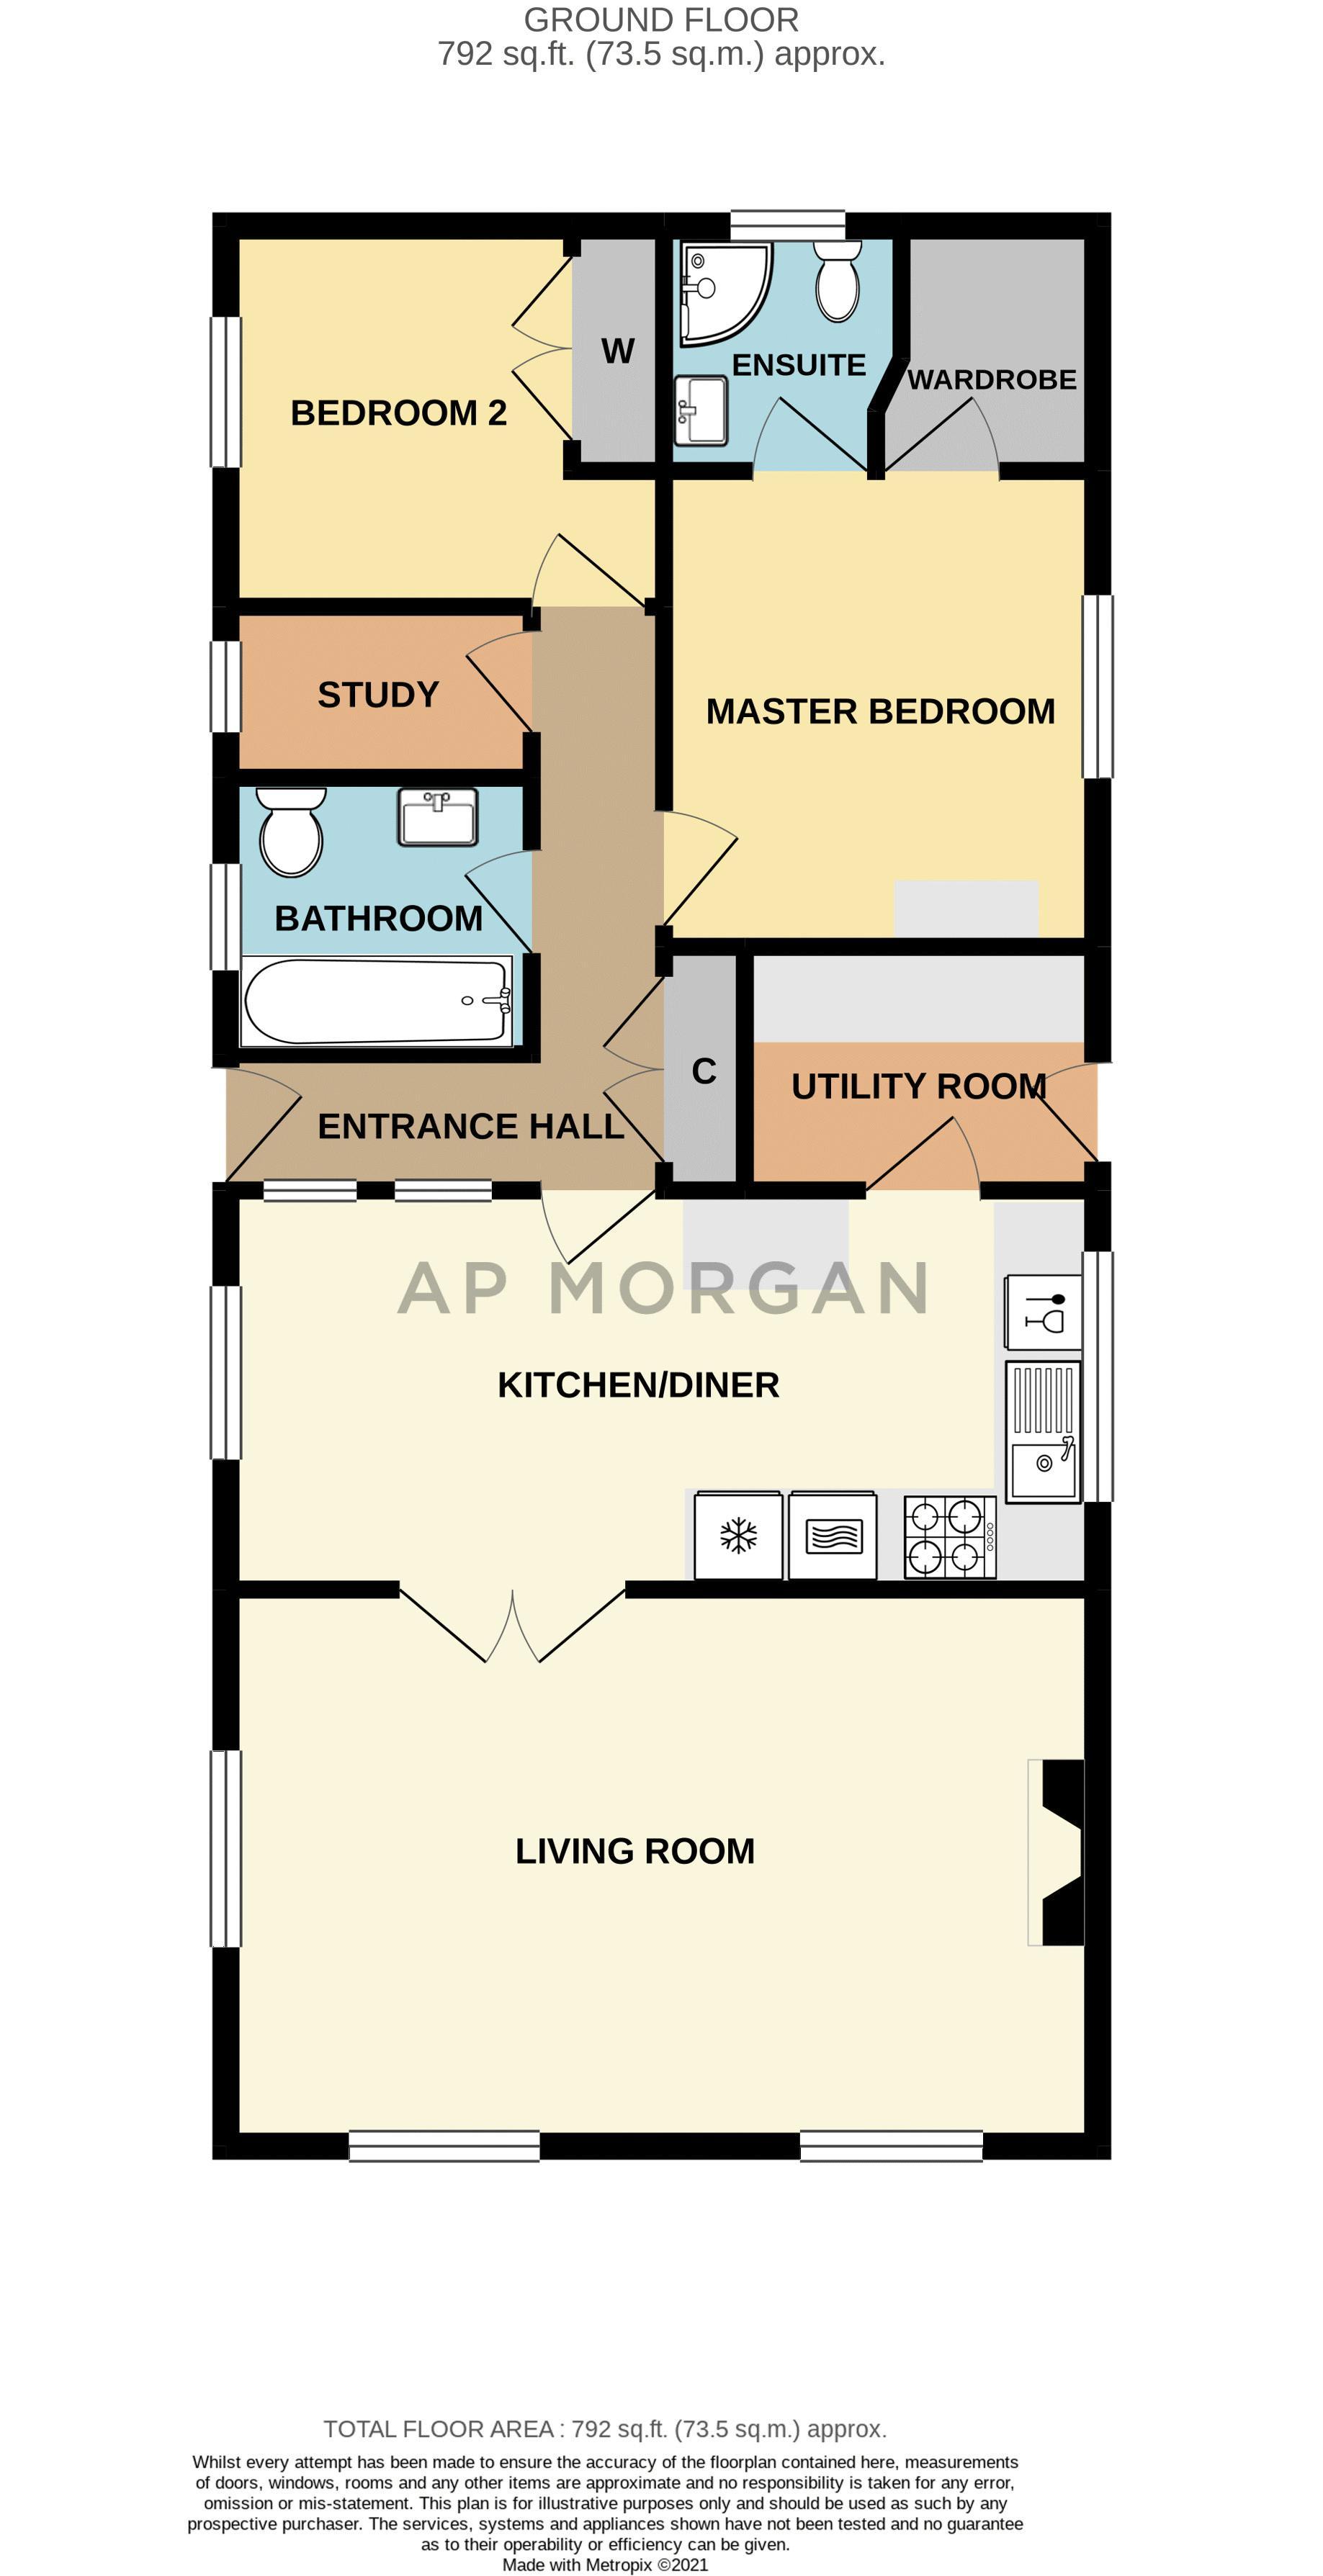 2 bed  for sale in Juggins Lane - Property Floorplan